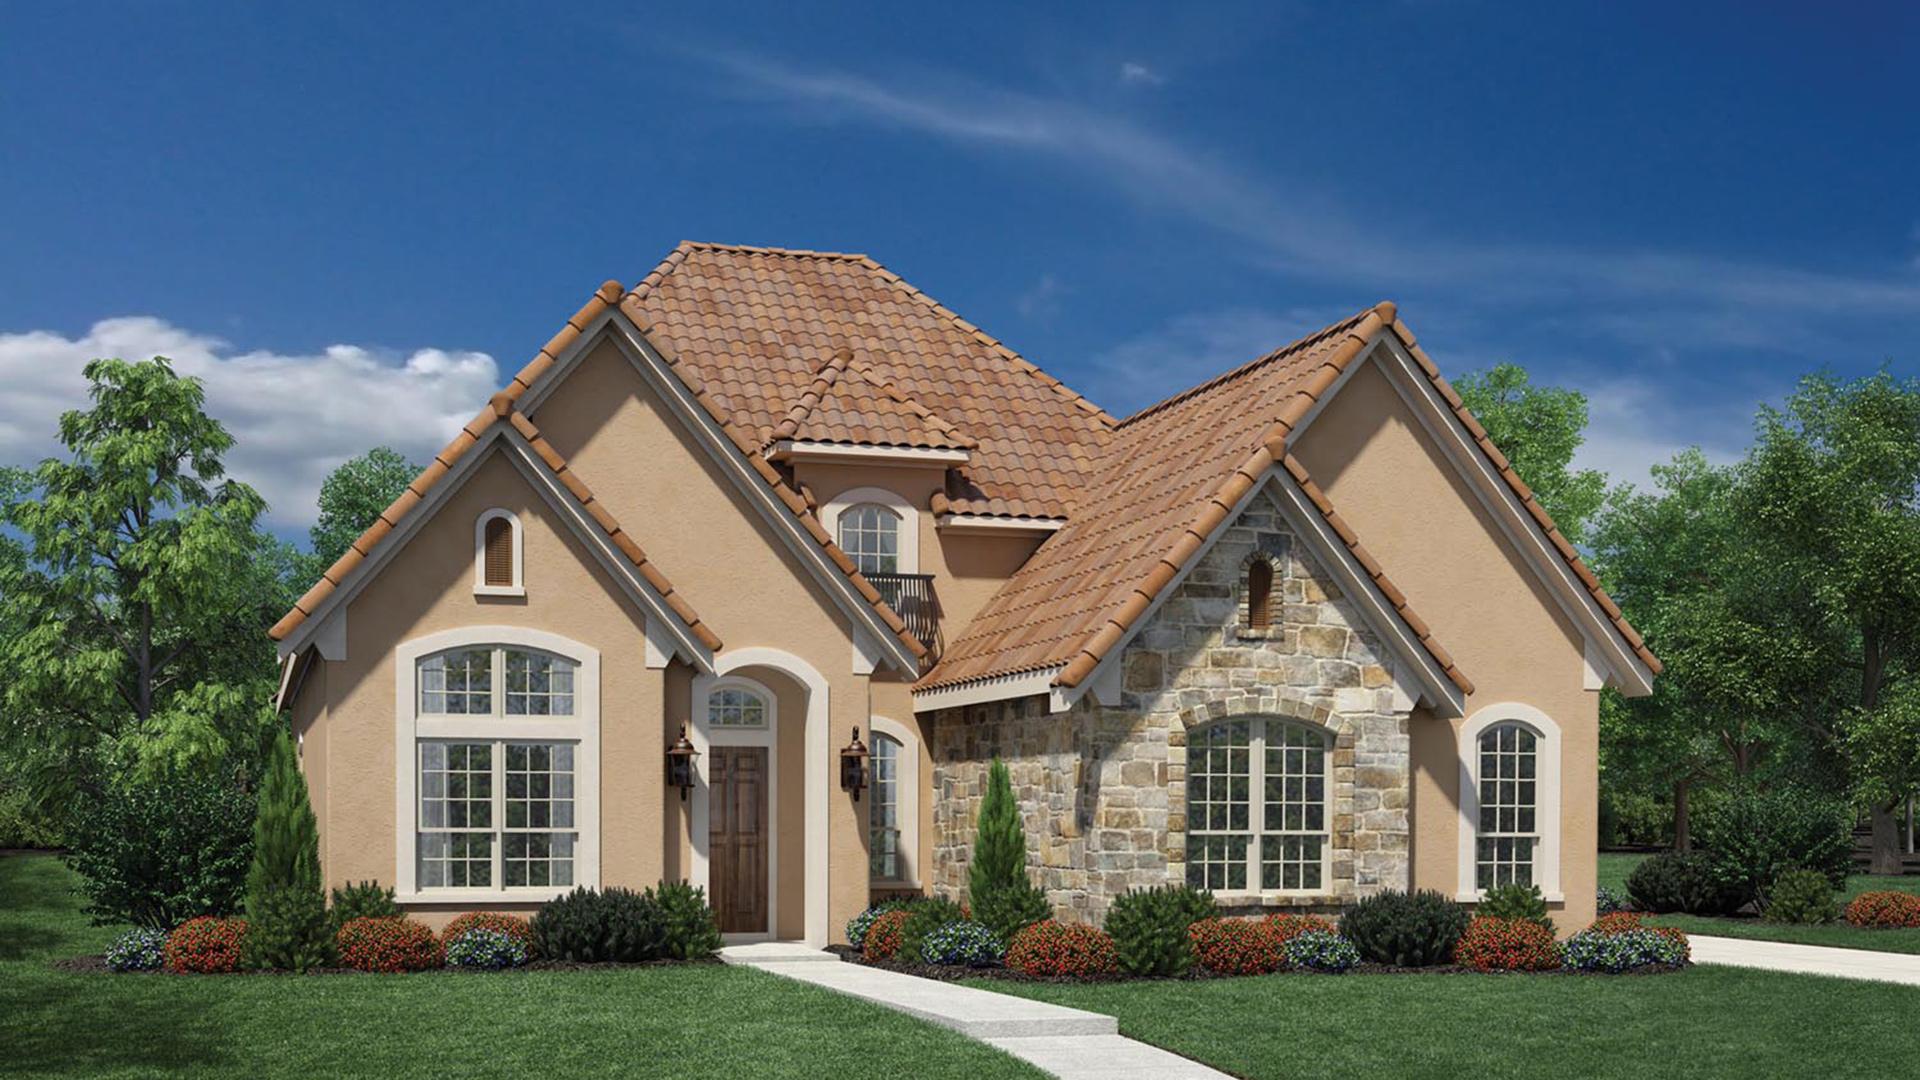 STNT_TUS_TX_3SPE_301_654_4_1920 Stanton Home Design on garrison home design, cobb home design, tranquility home design,